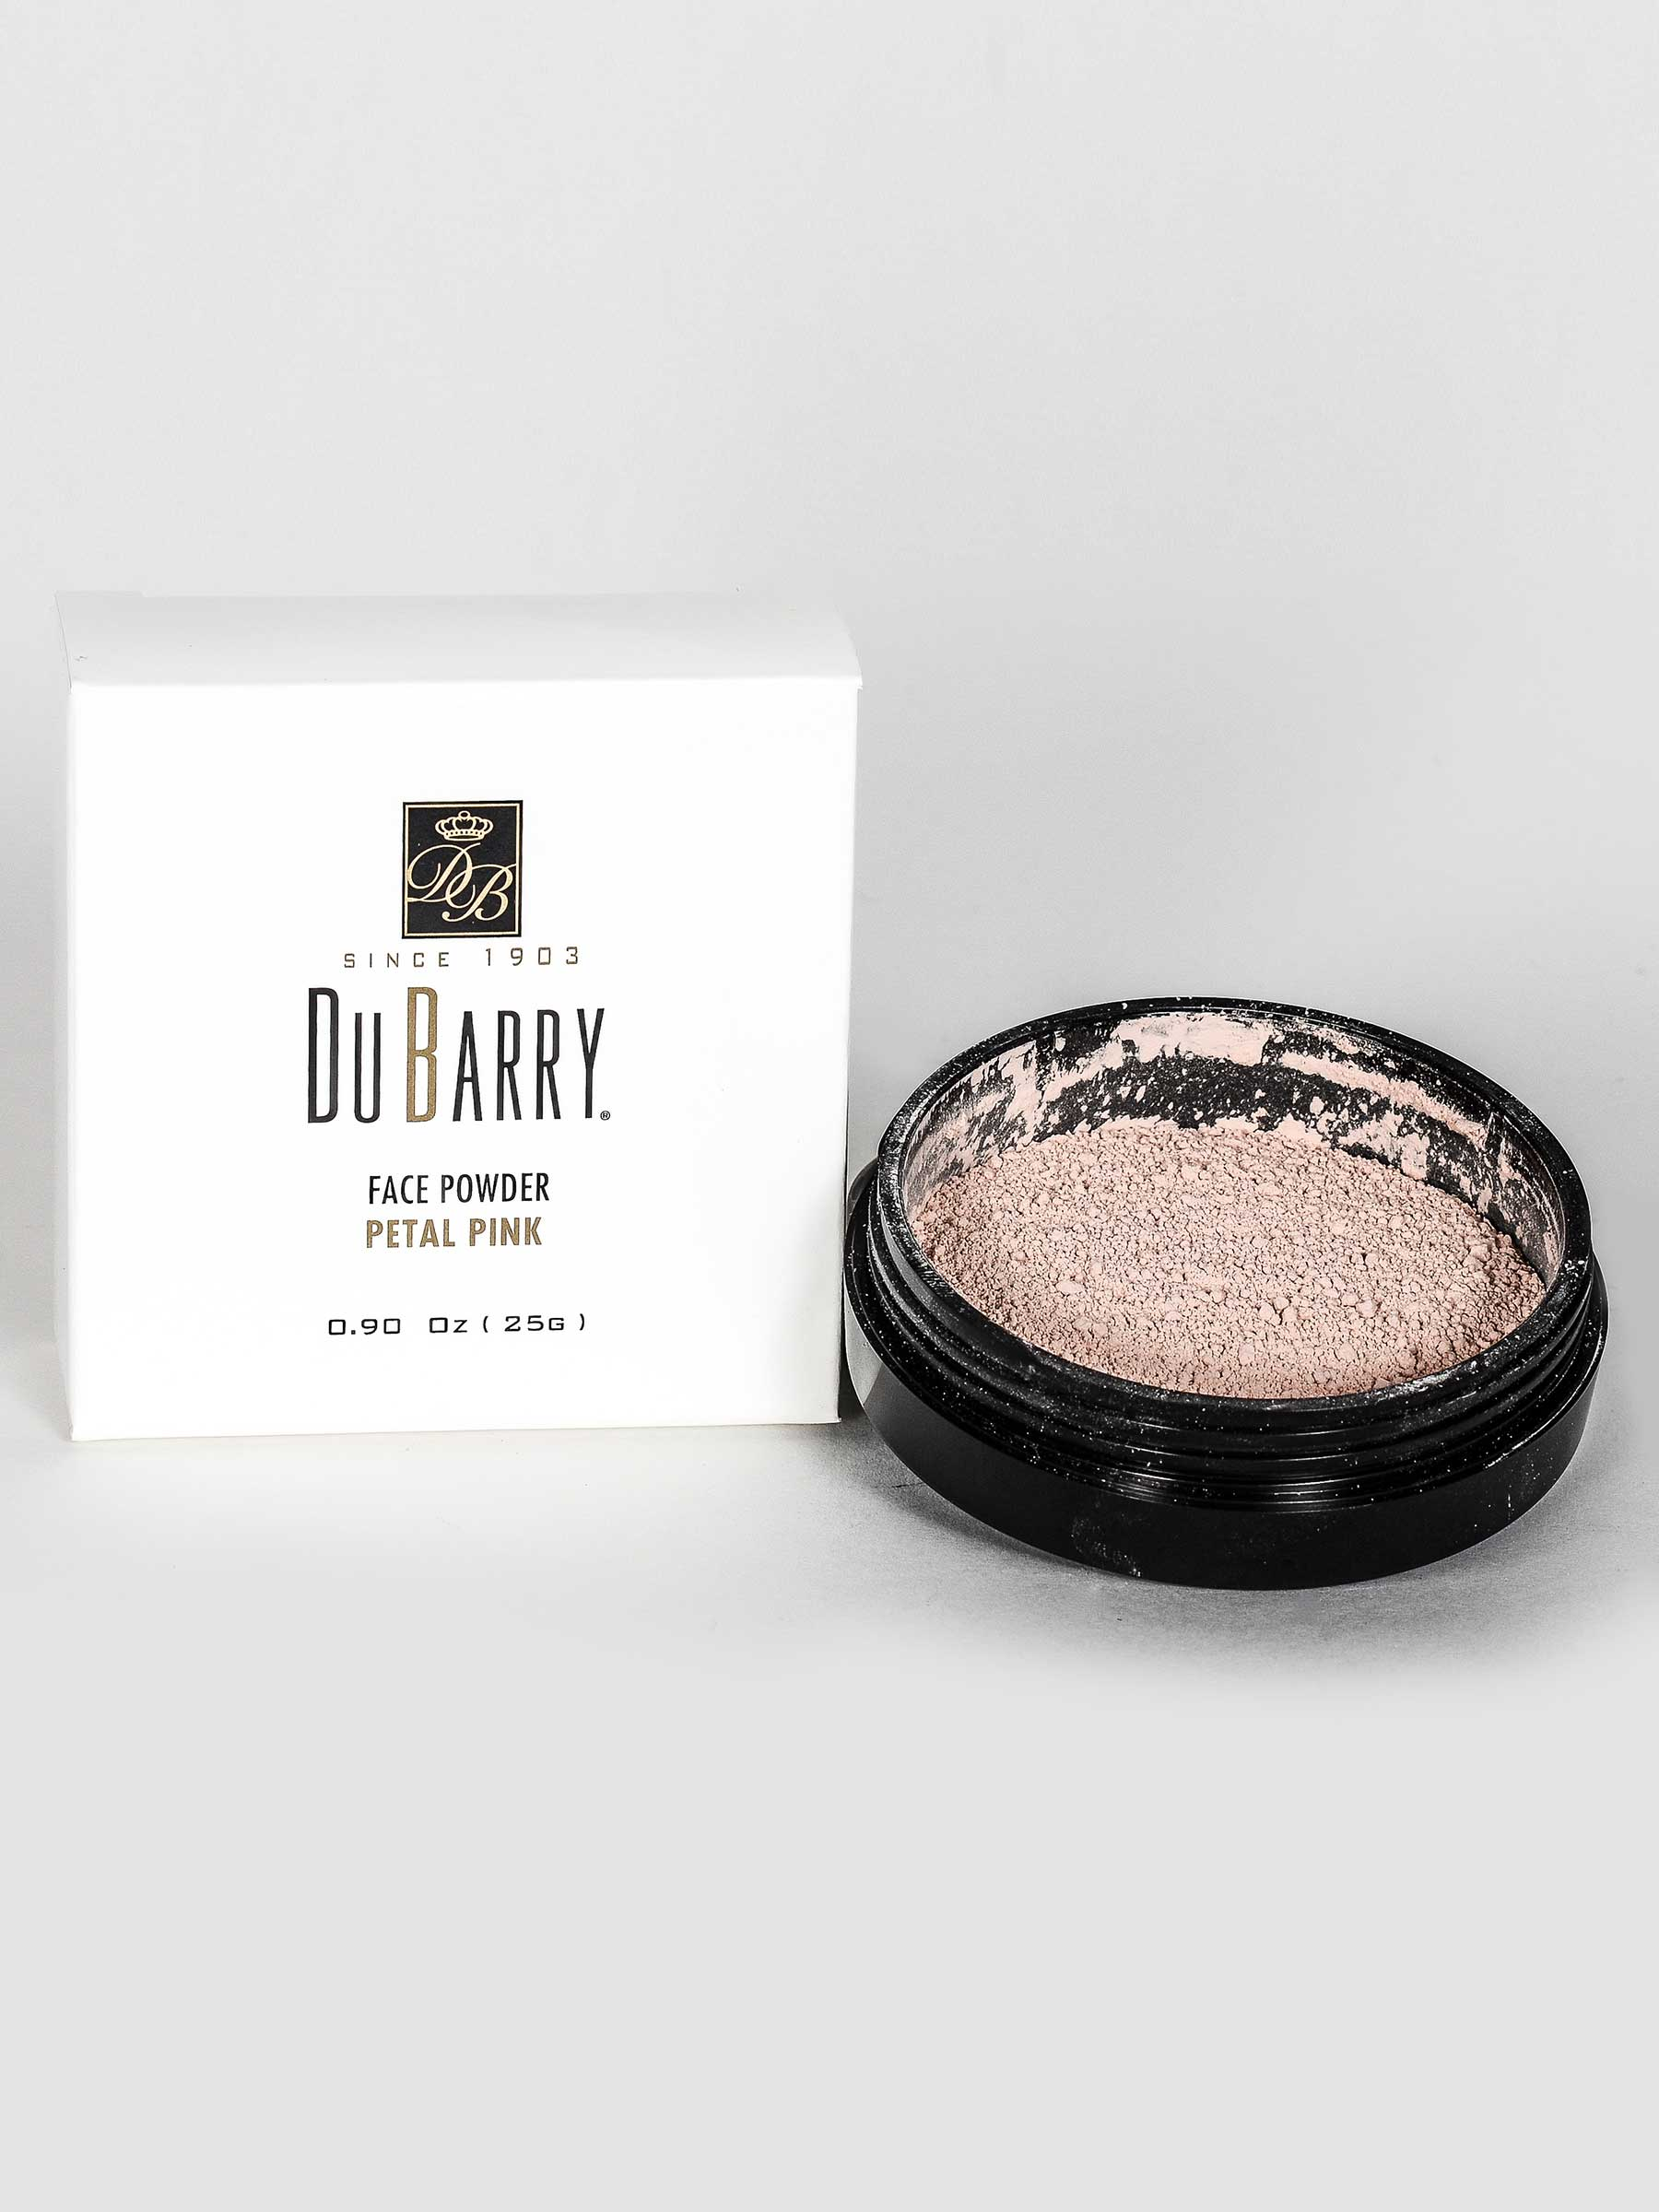 DuBarry Face Powder - Petal Pink